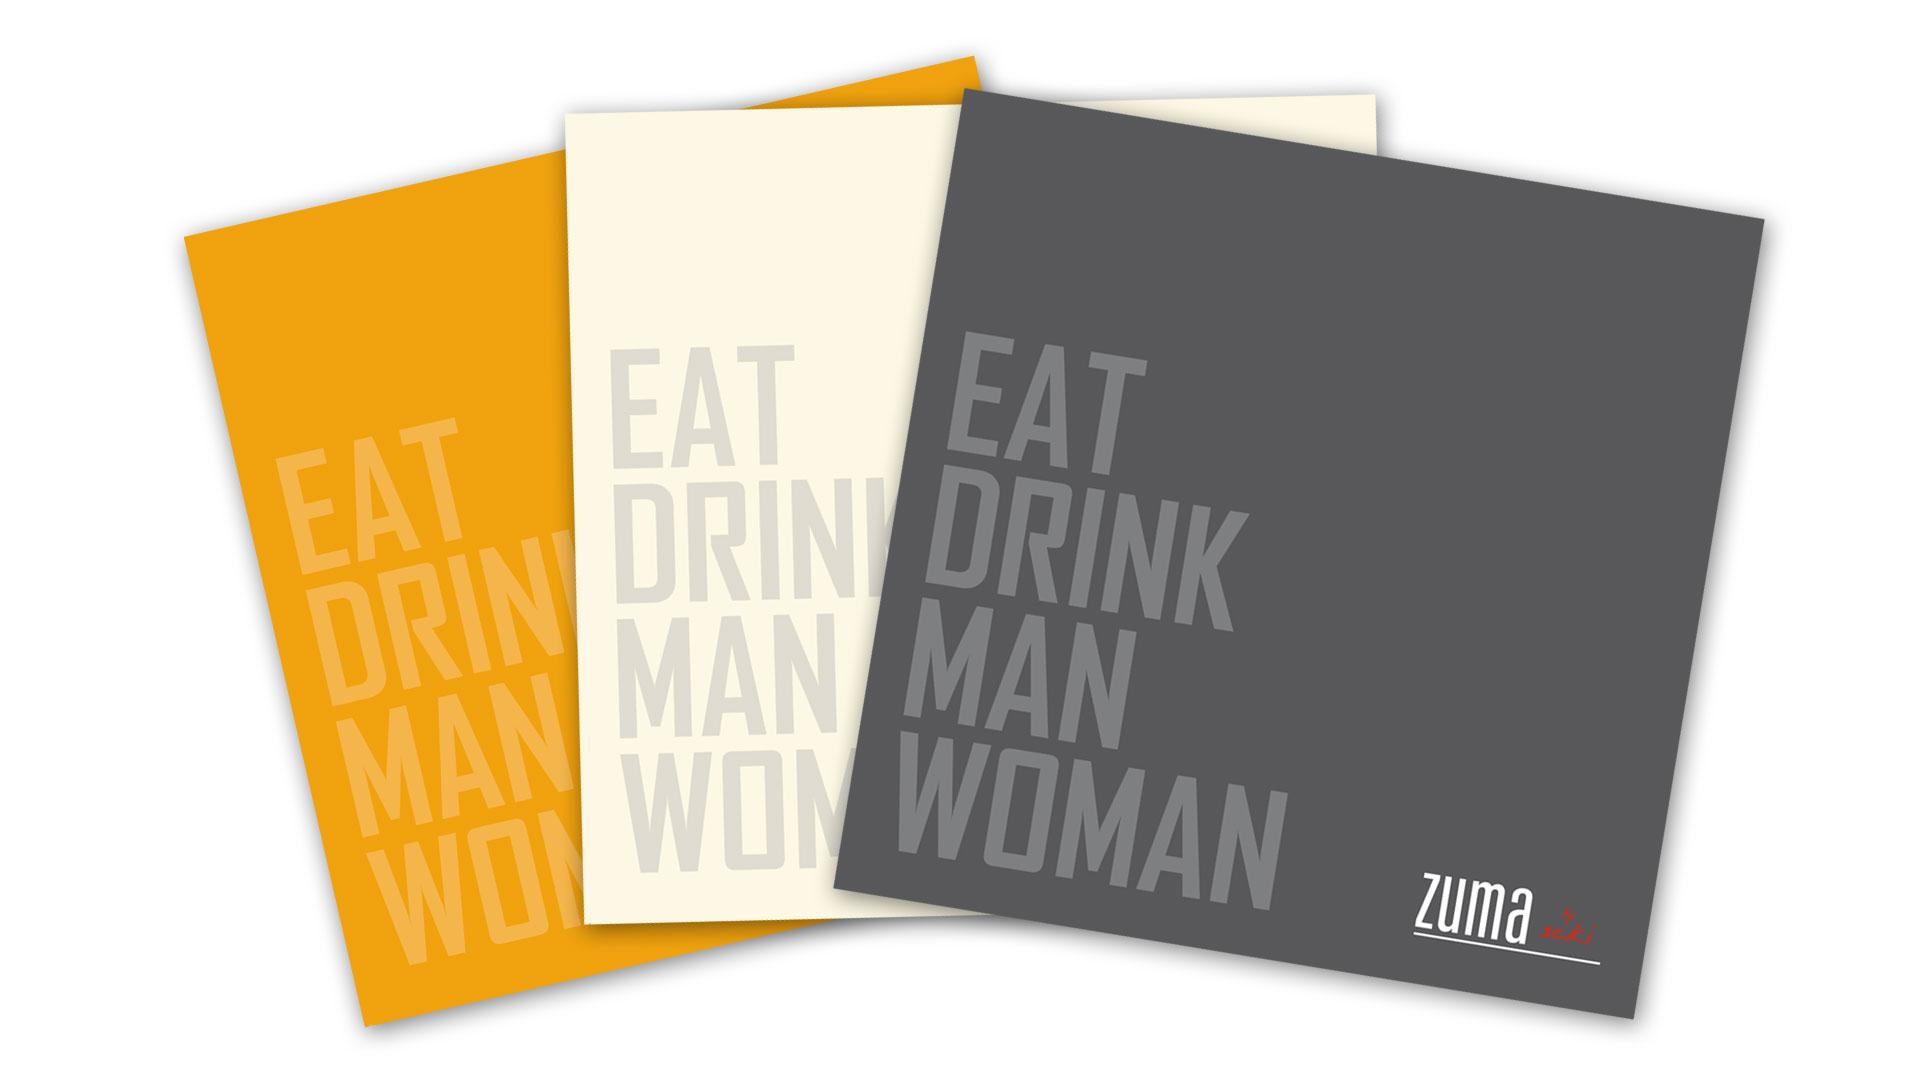 Restaurant Zuma Villingen